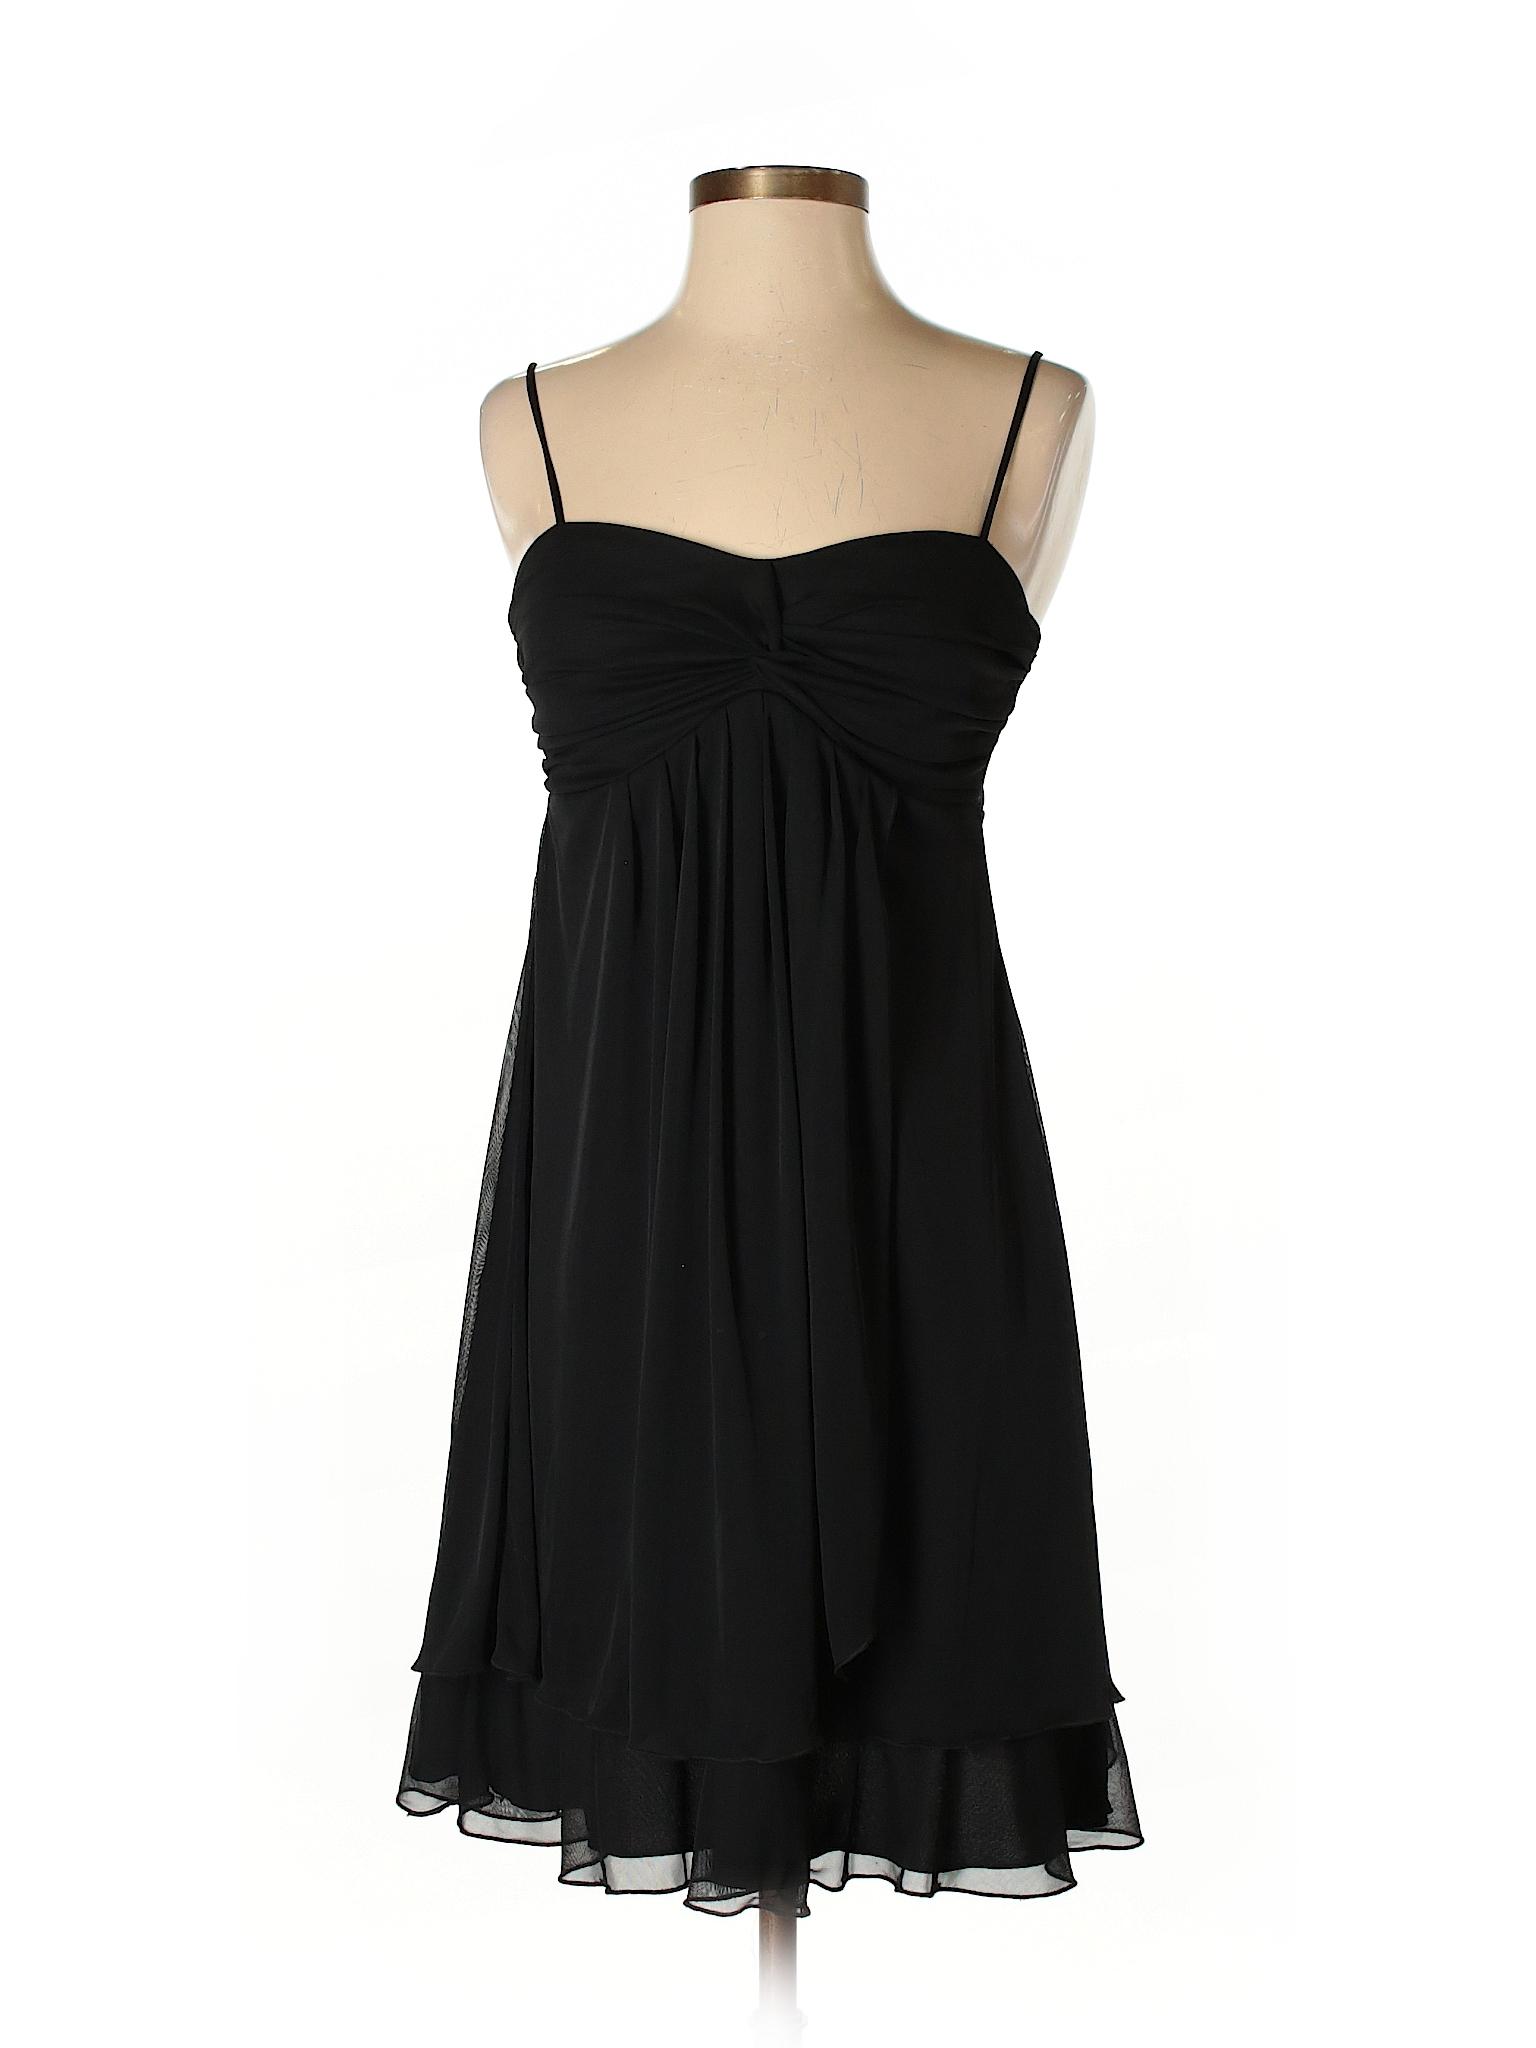 winter Dress Boutique Y Casual Studio pqznPwXa